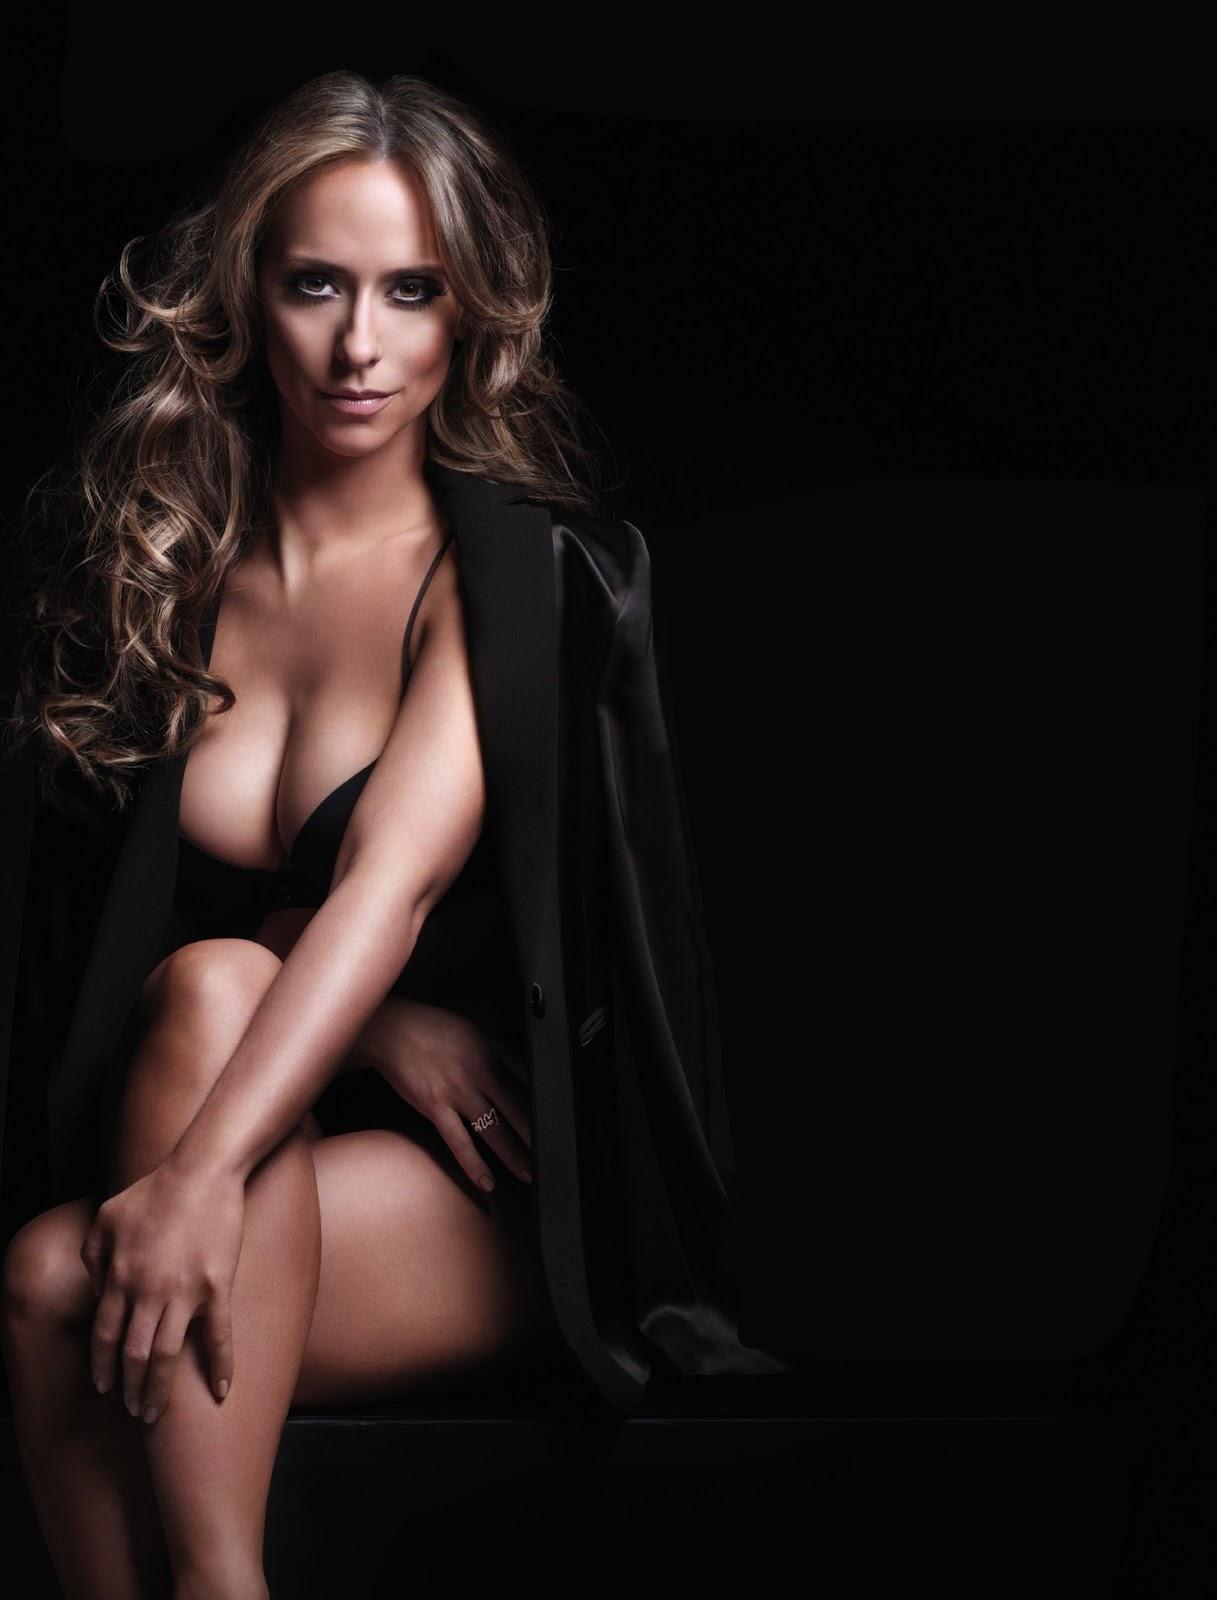 Adolescentes colombianass britney spears desnuda pillada gratis 80